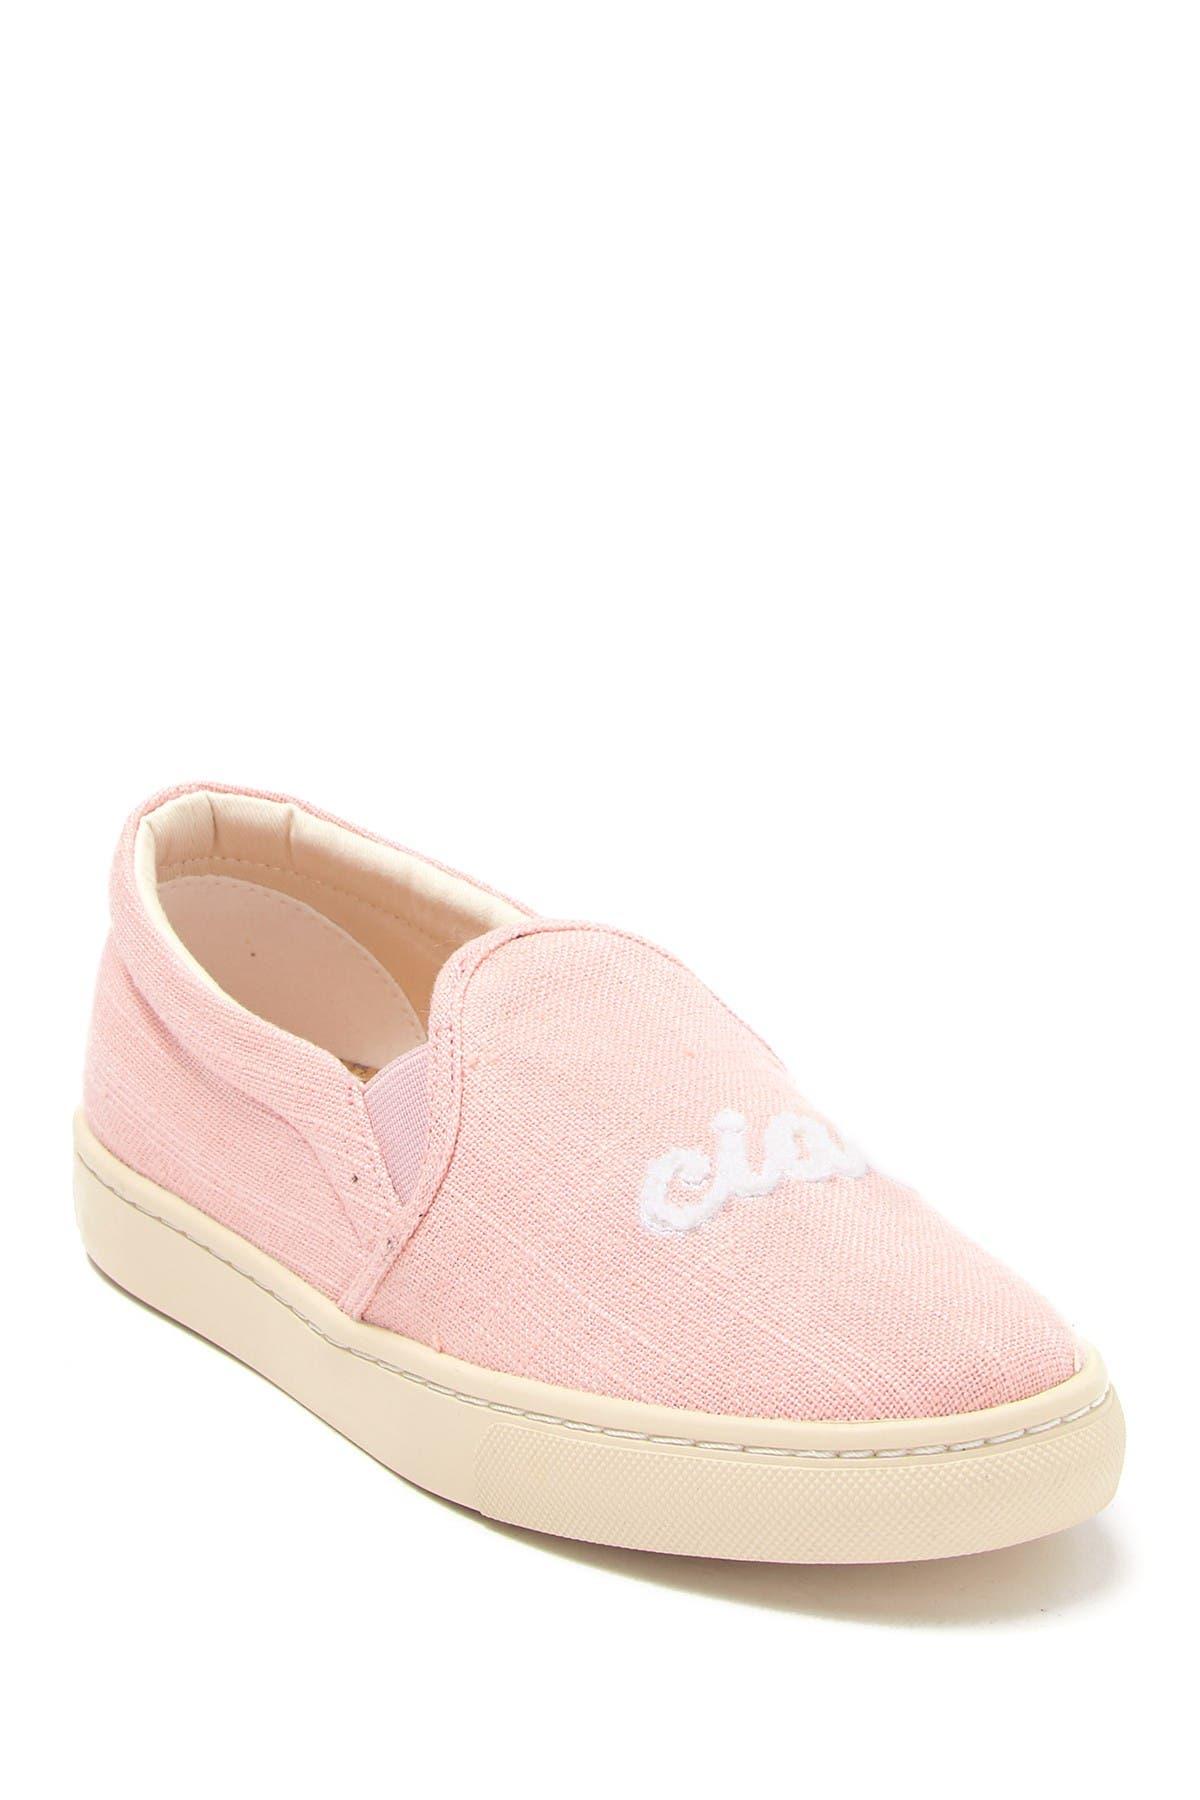 Soludos | Ciao Bella Slip-On Sneaker